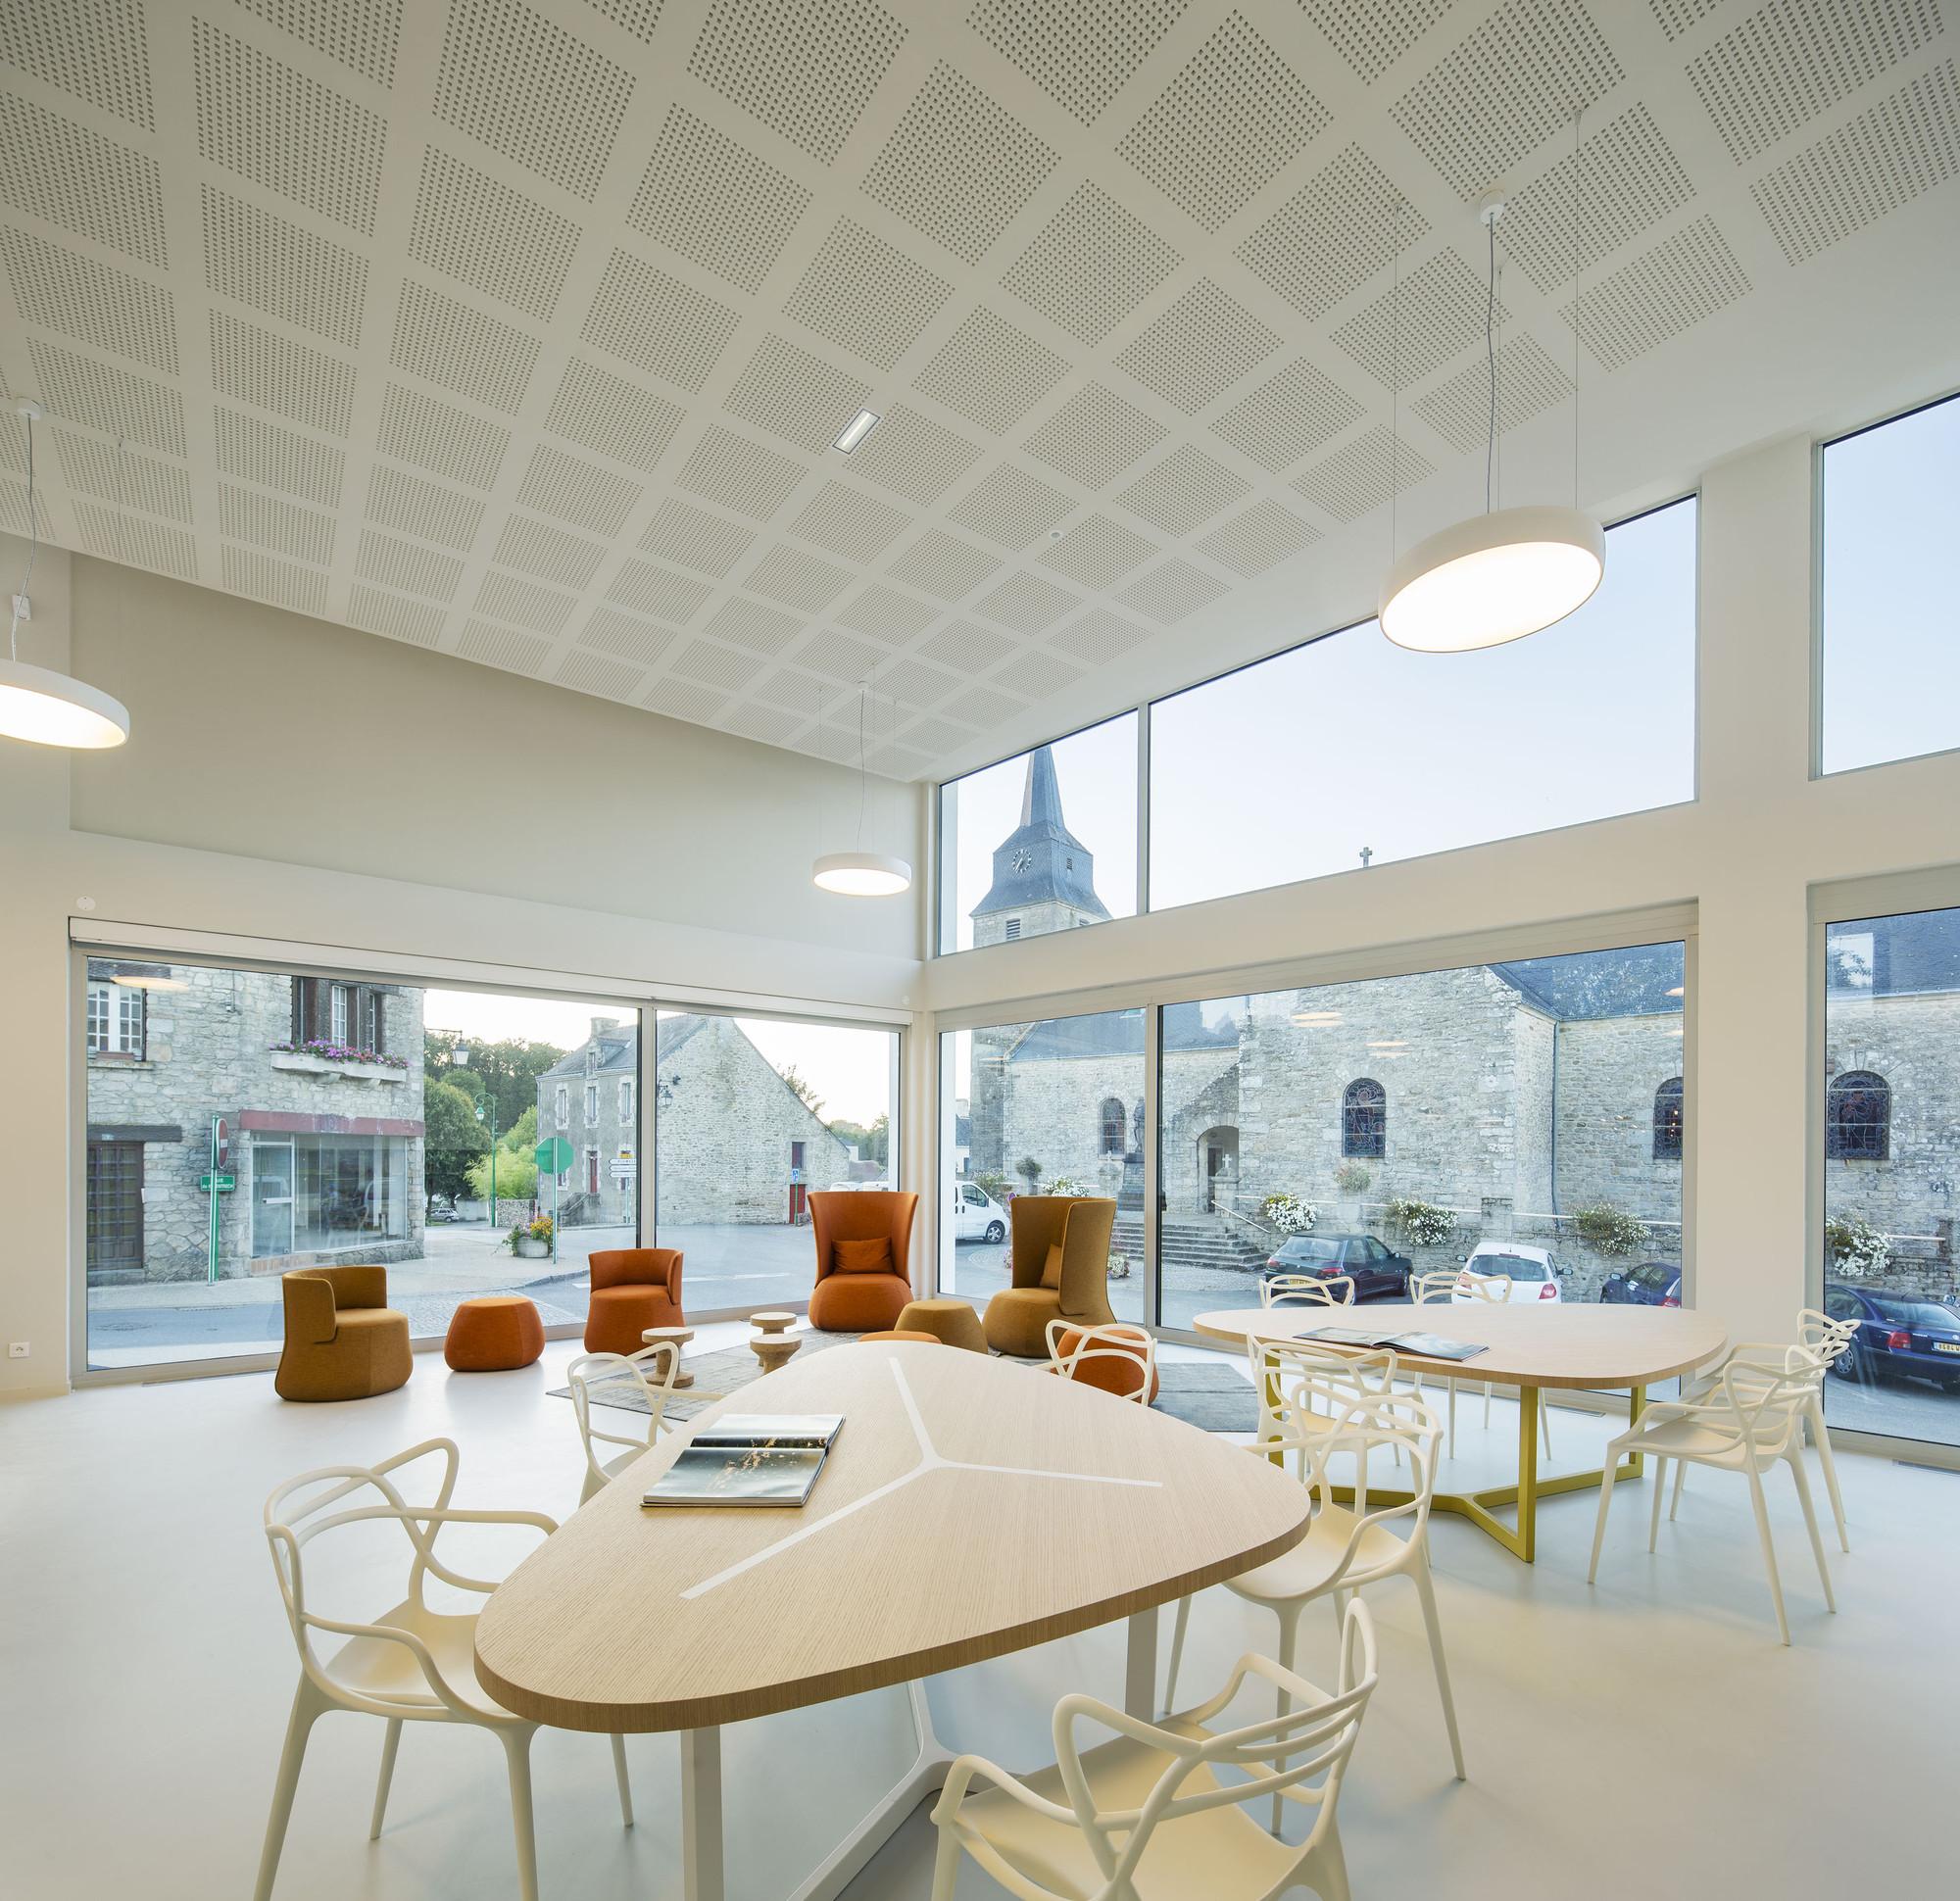 Médiatheque de Monterblanc / Studio 02, © Luc Boegly